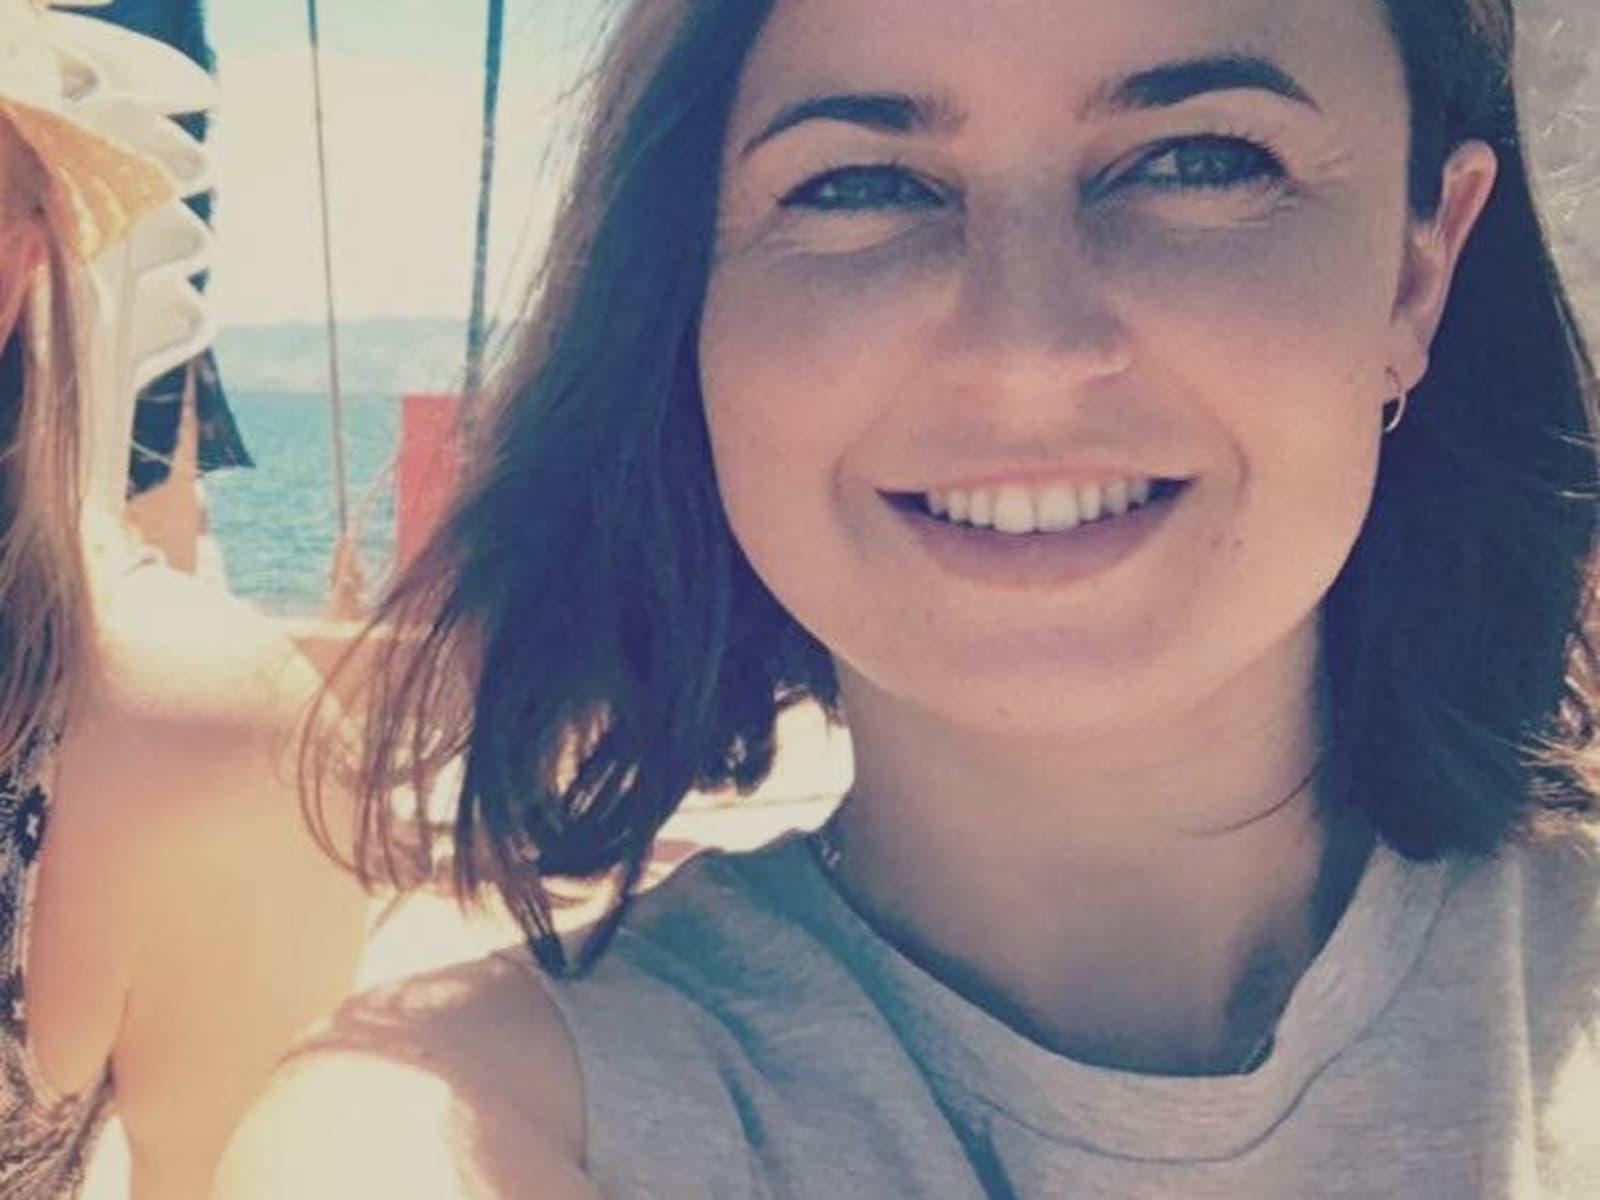 Rachel from Sydney, New South Wales, Australia